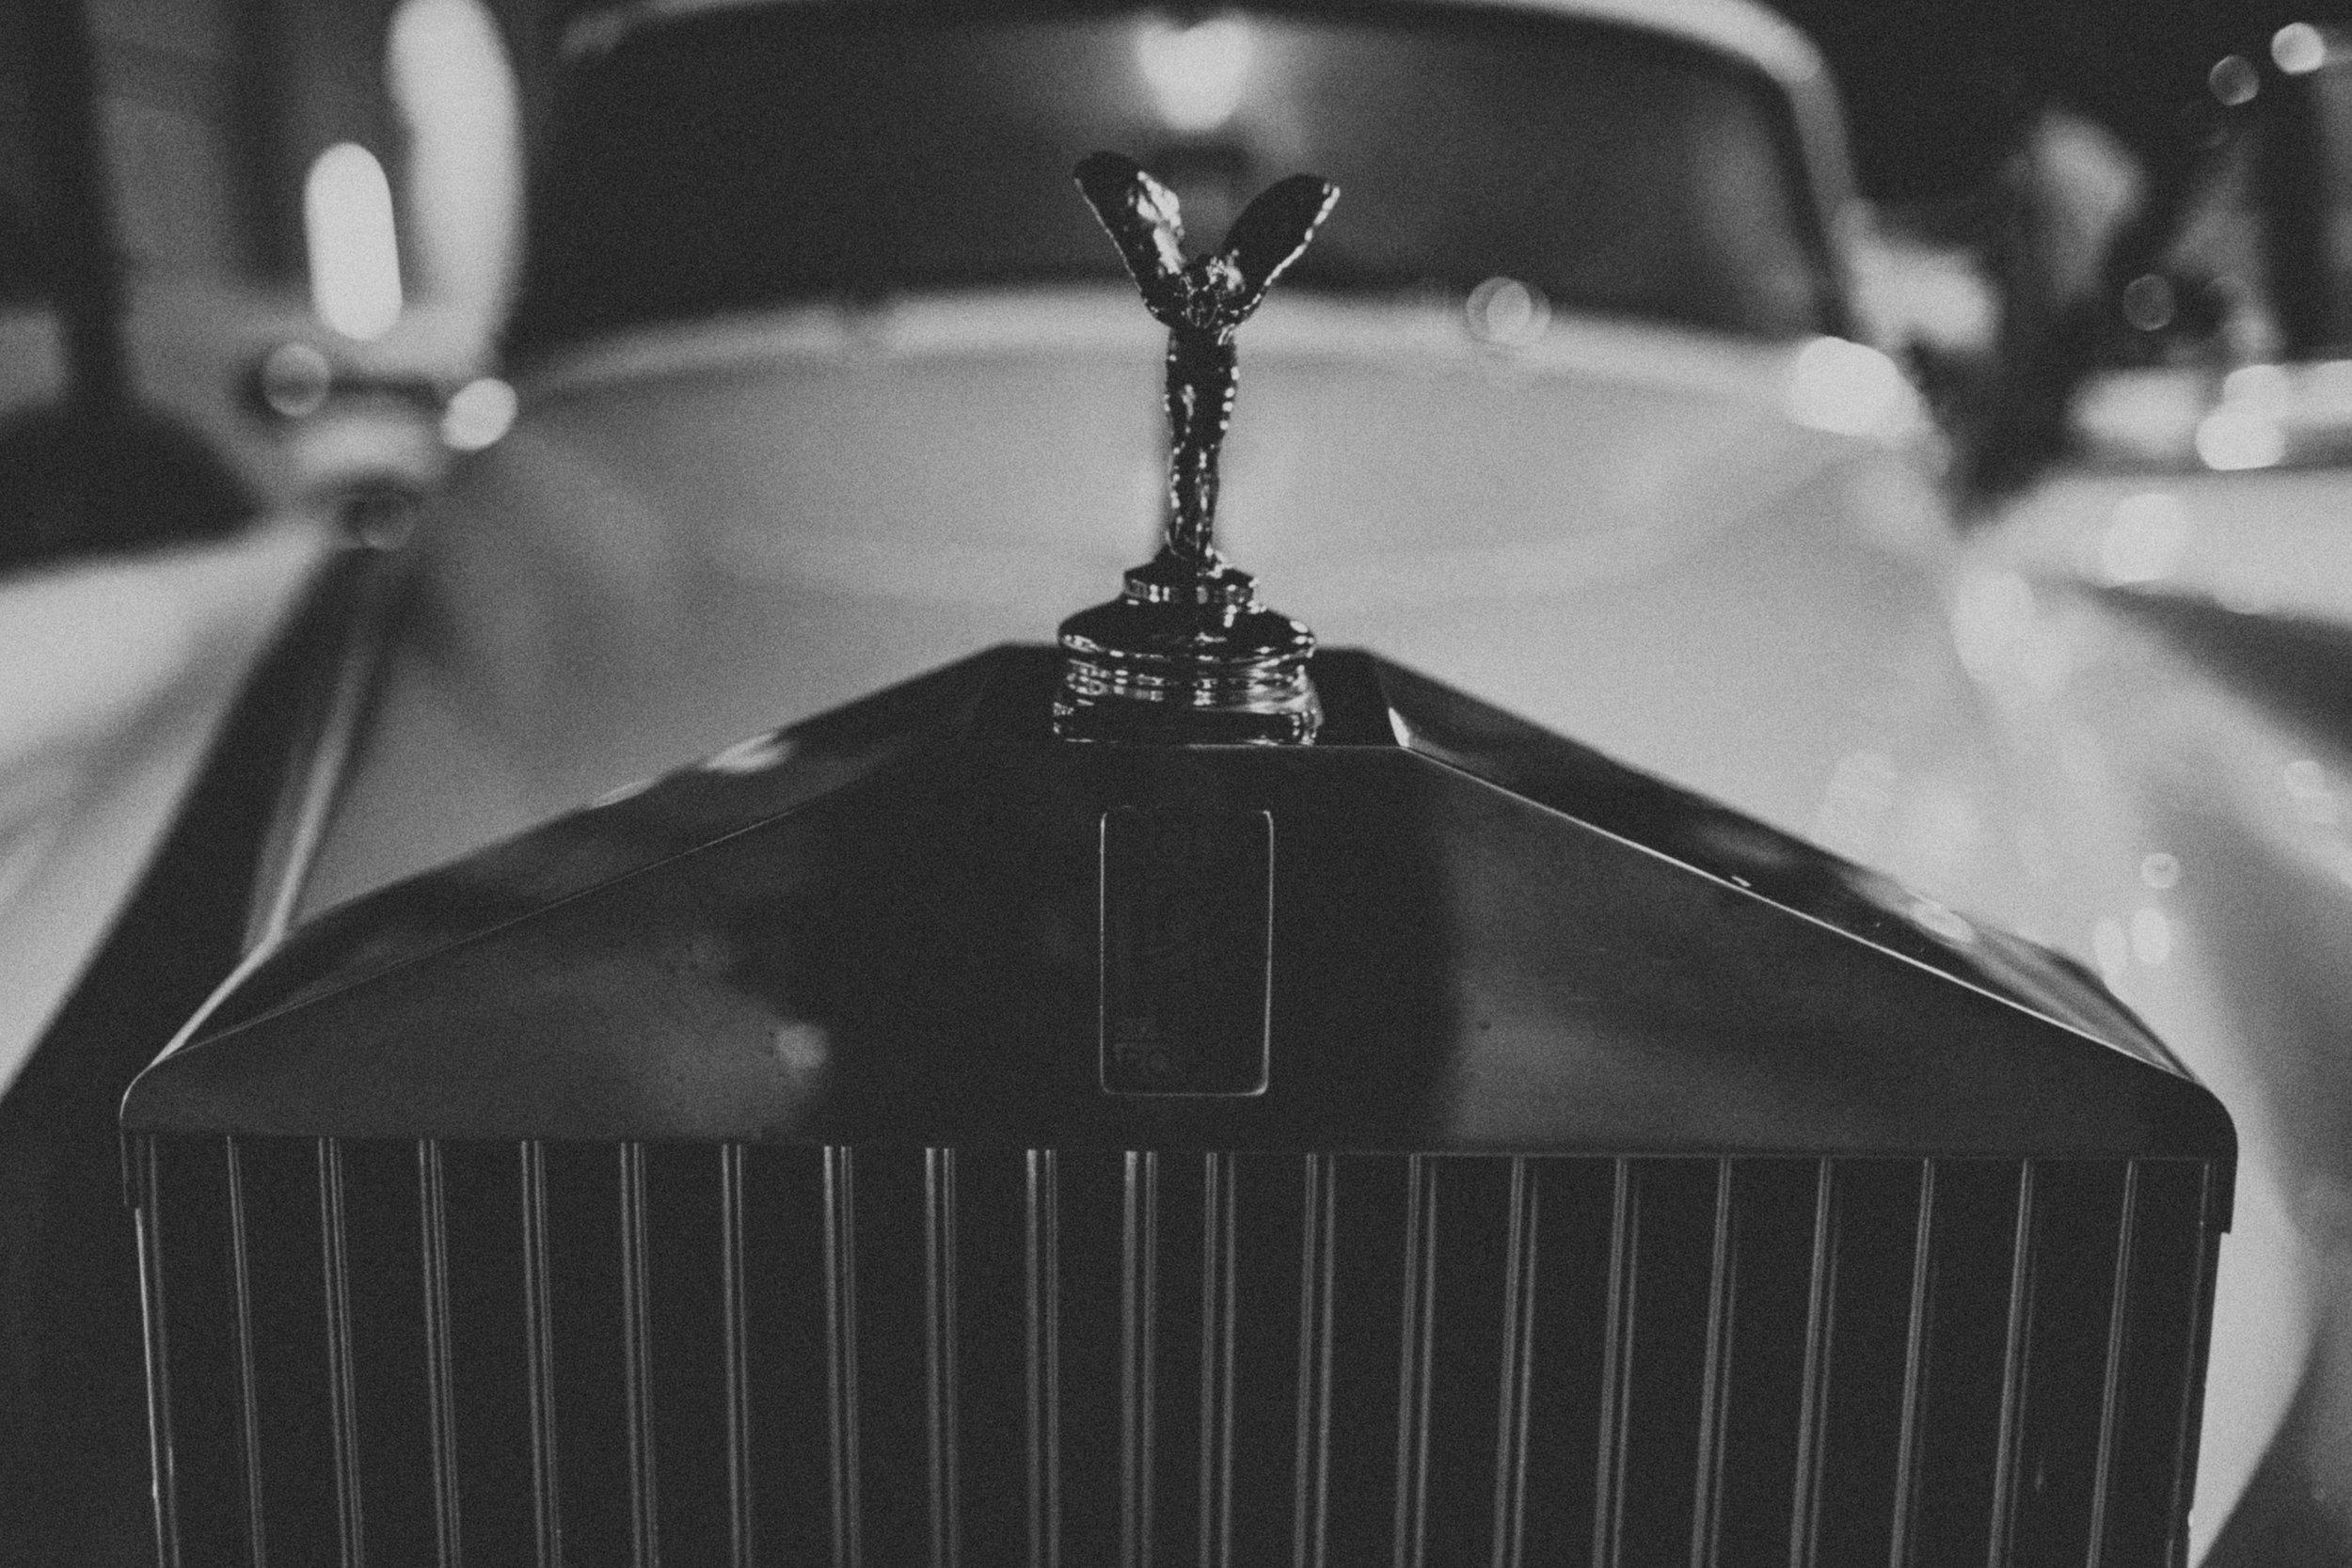 Southern Fete, Southern Wedding, Getaway car, Kimbrali Photograhy